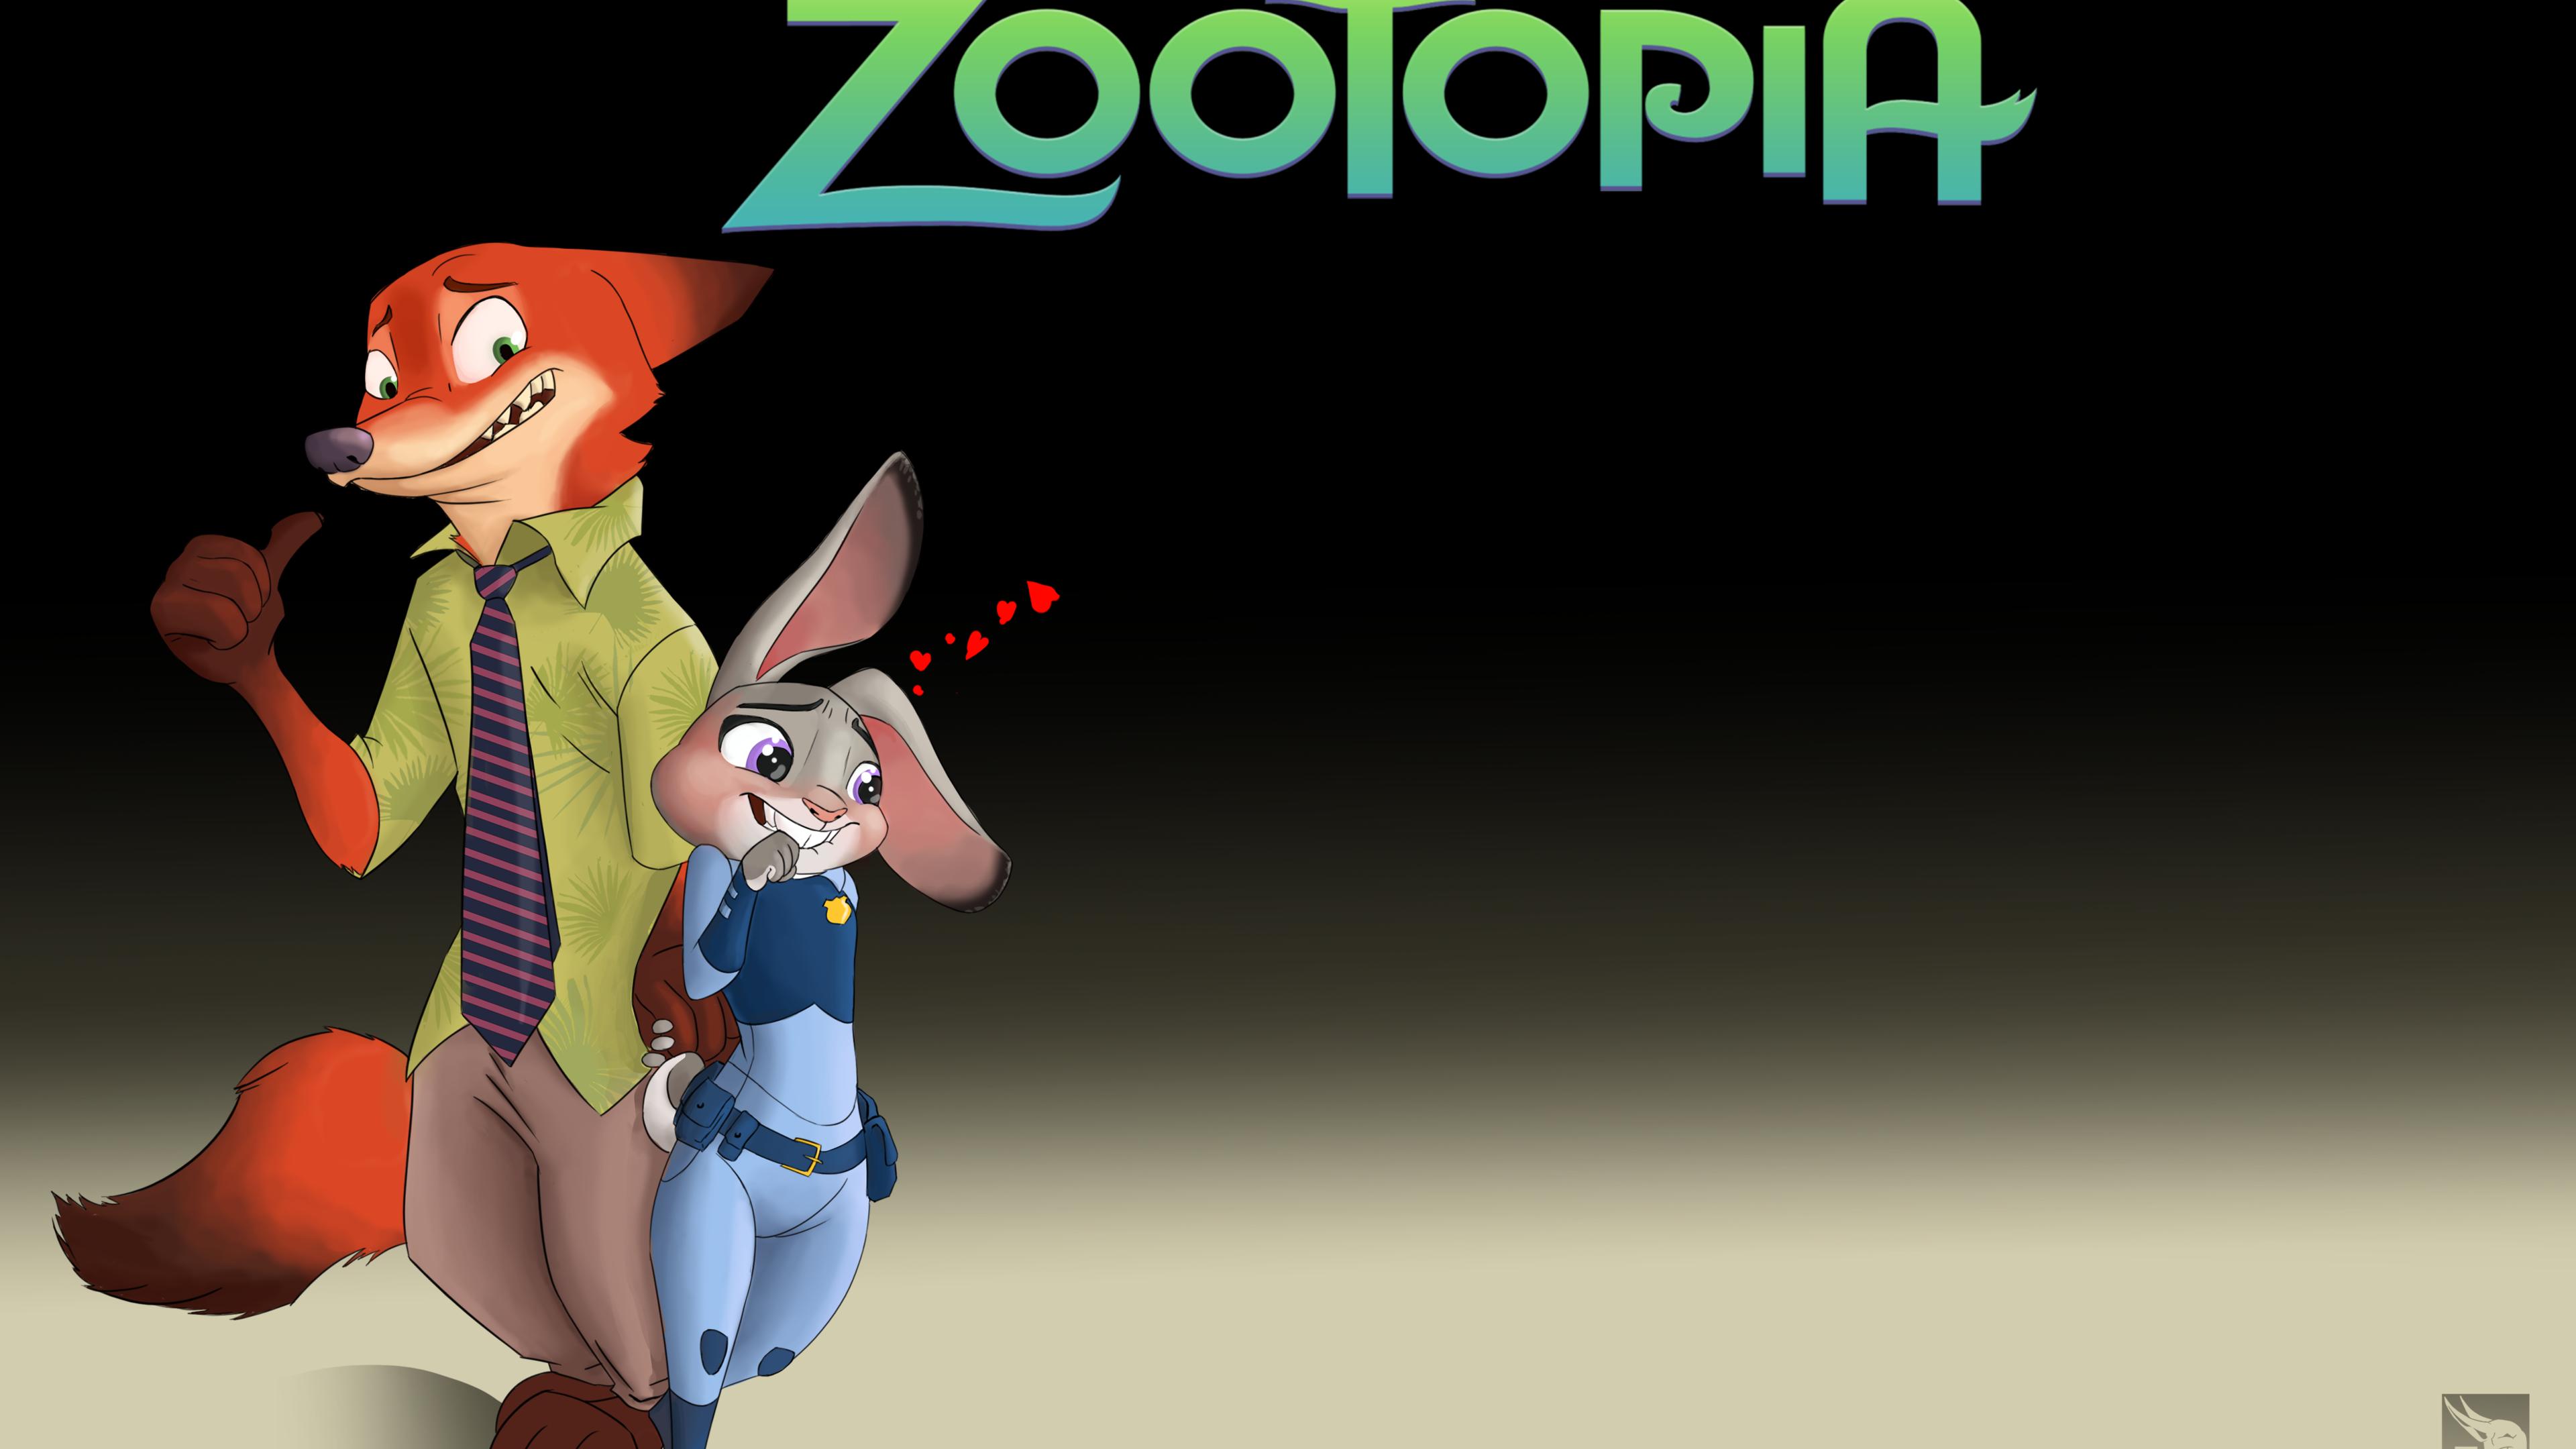 zootopia movie poster 1536362273 - Zootopia Movie Poster - zootopia wallpapers, movies wallpapers, cartoons wallpapers, animated movies wallpapers, 2016 movies wallpapers